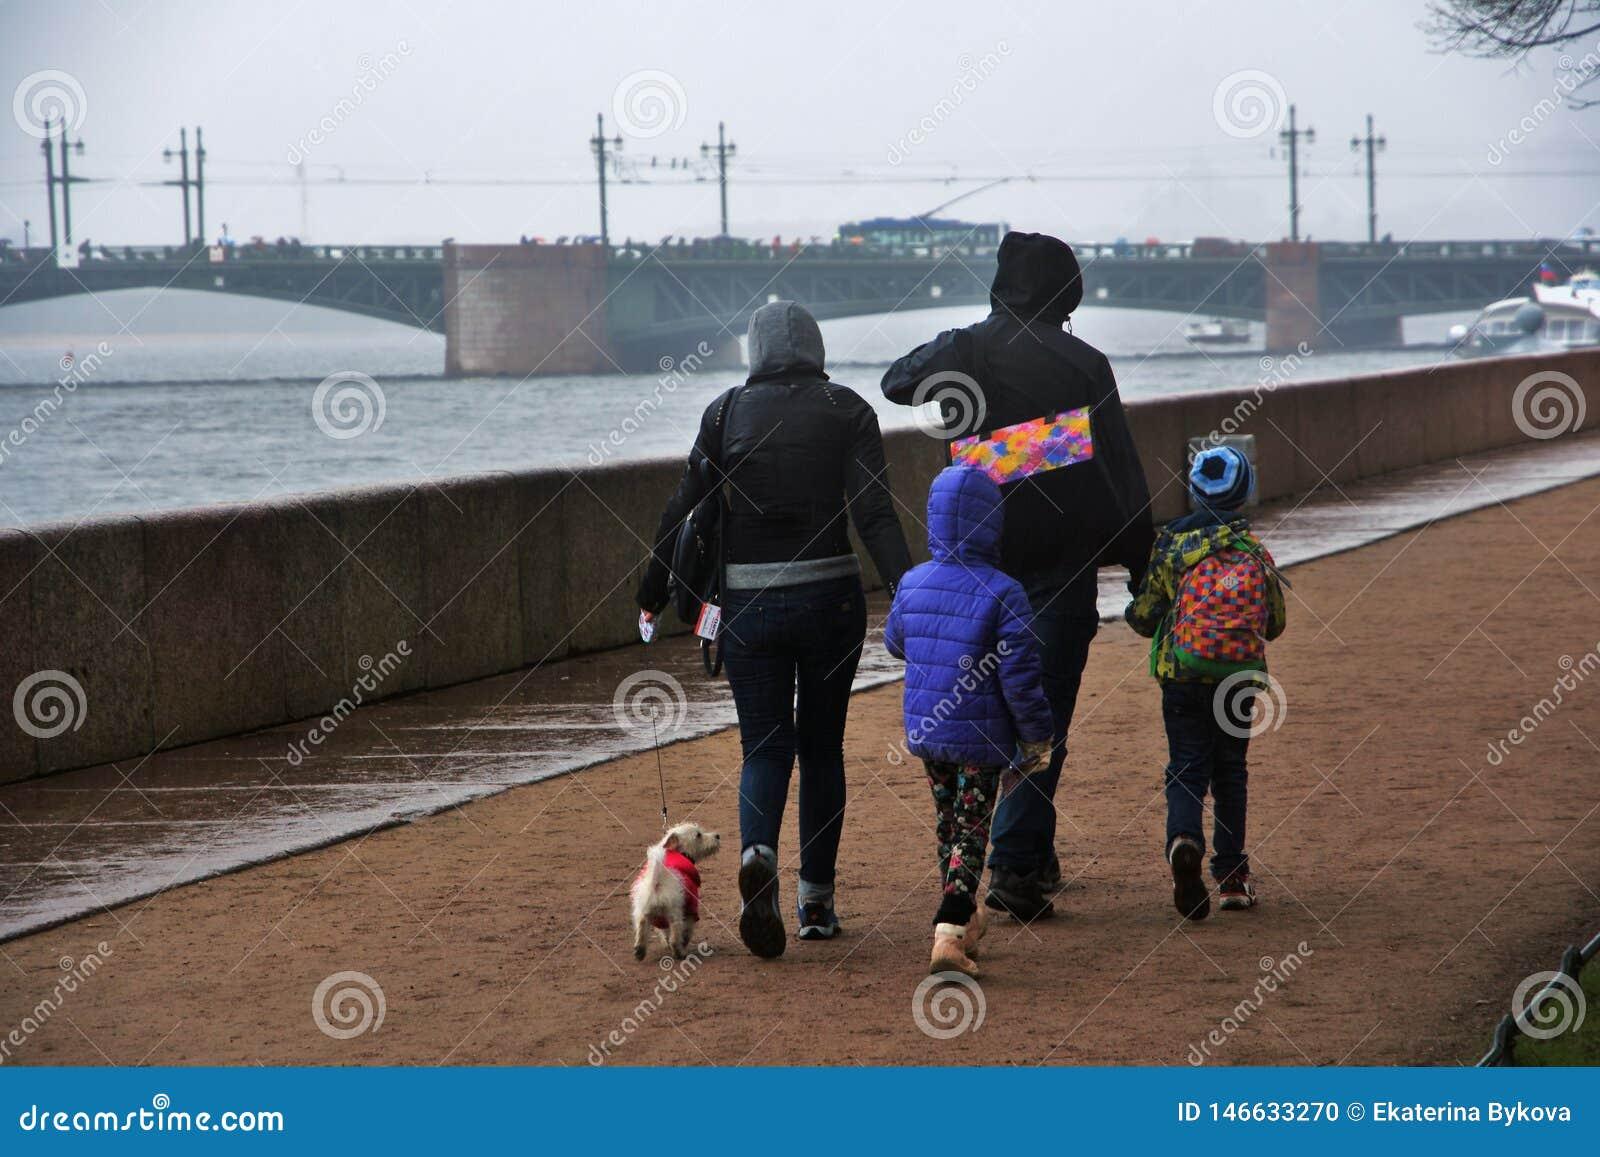 People walk in Saint Petersburg under umbrella